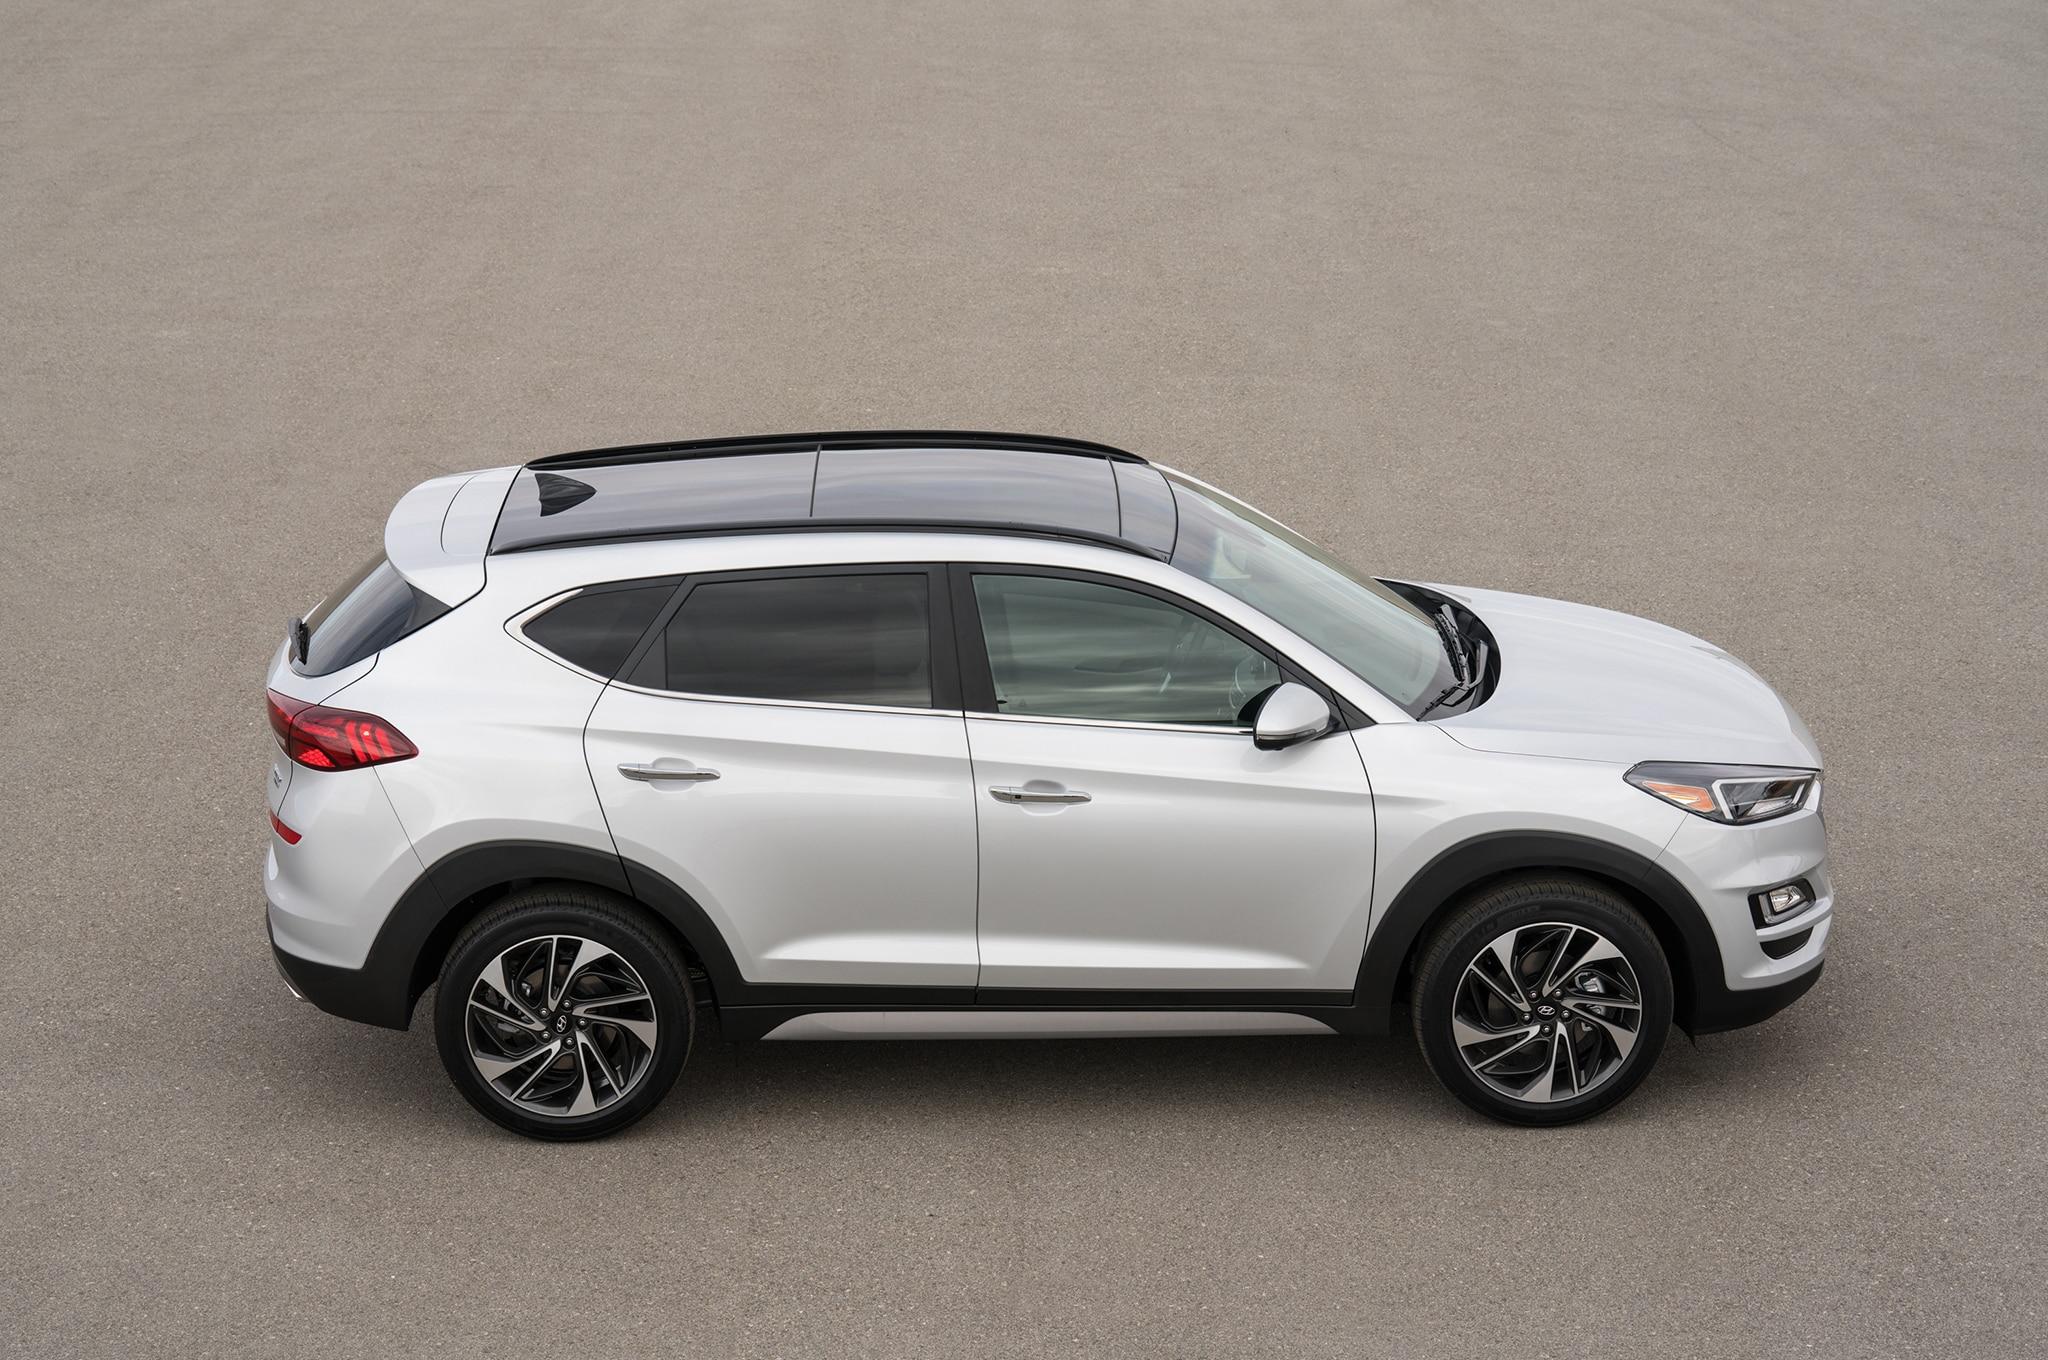 2015 - [Hyundai] Tucson III - Page 8 2019-Hyundai-Tucson-side-01